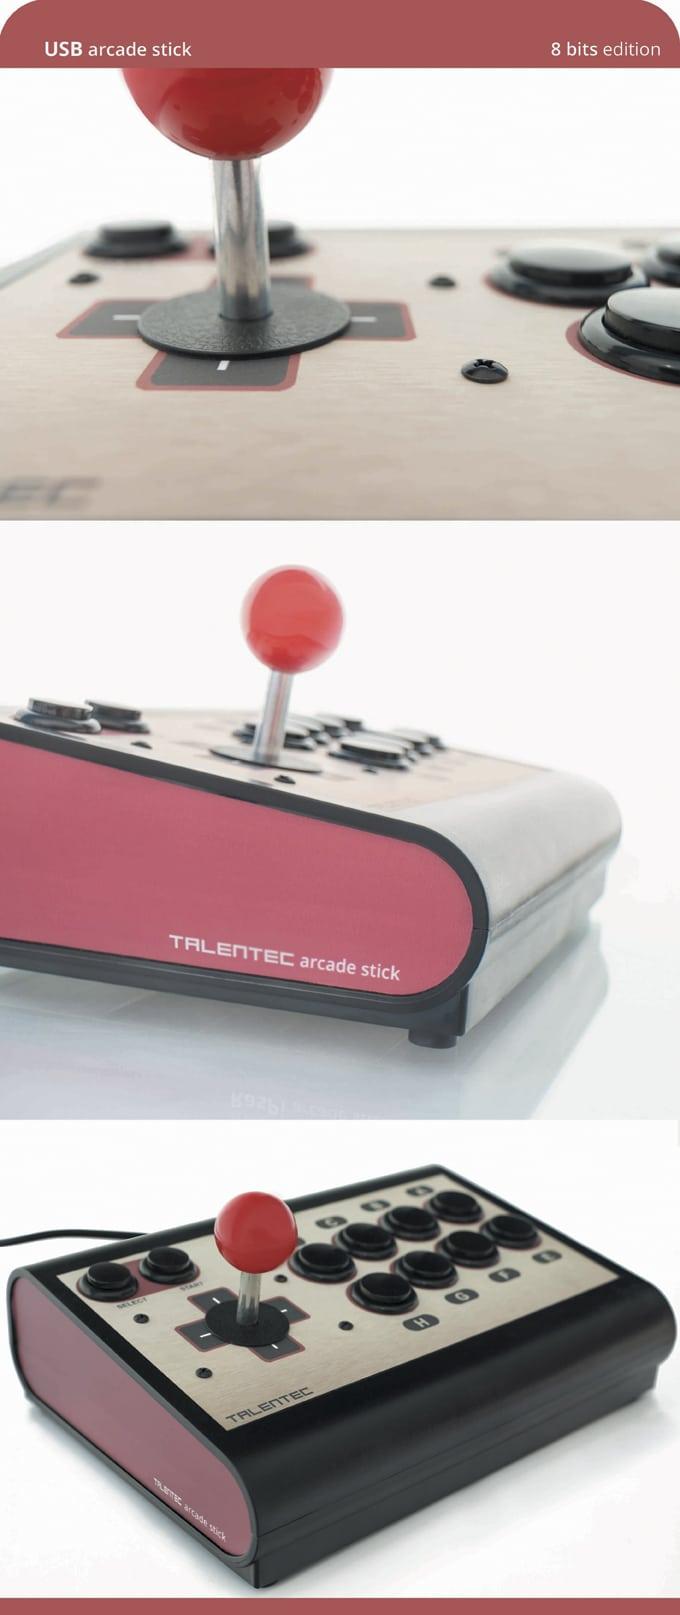 191022 8 bits USB arcade stick